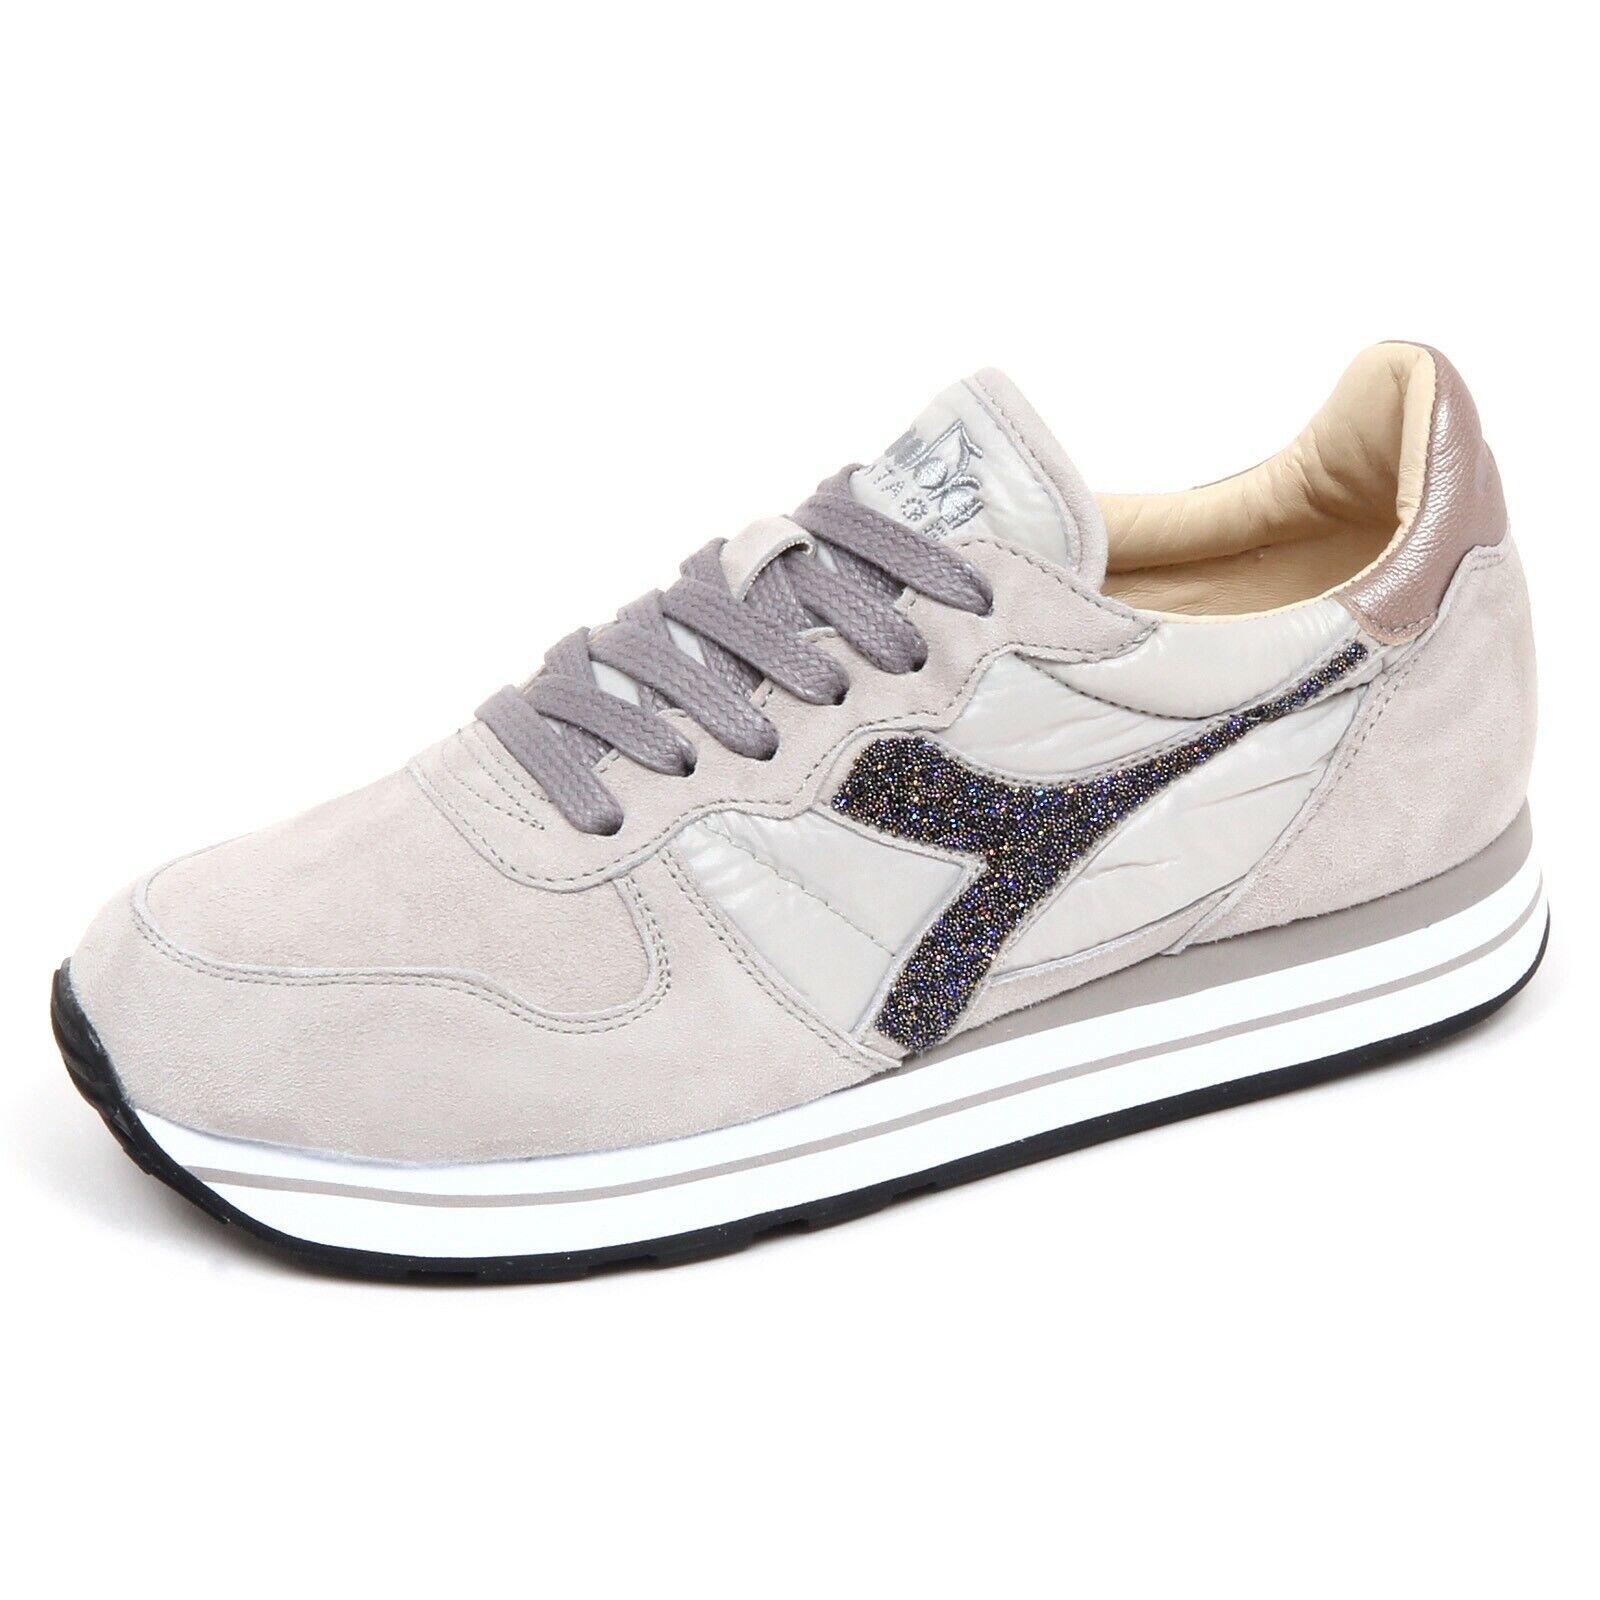 F7684 tenis mujer gris Diadora Heritage Camaro Cristales Zapato Mujer